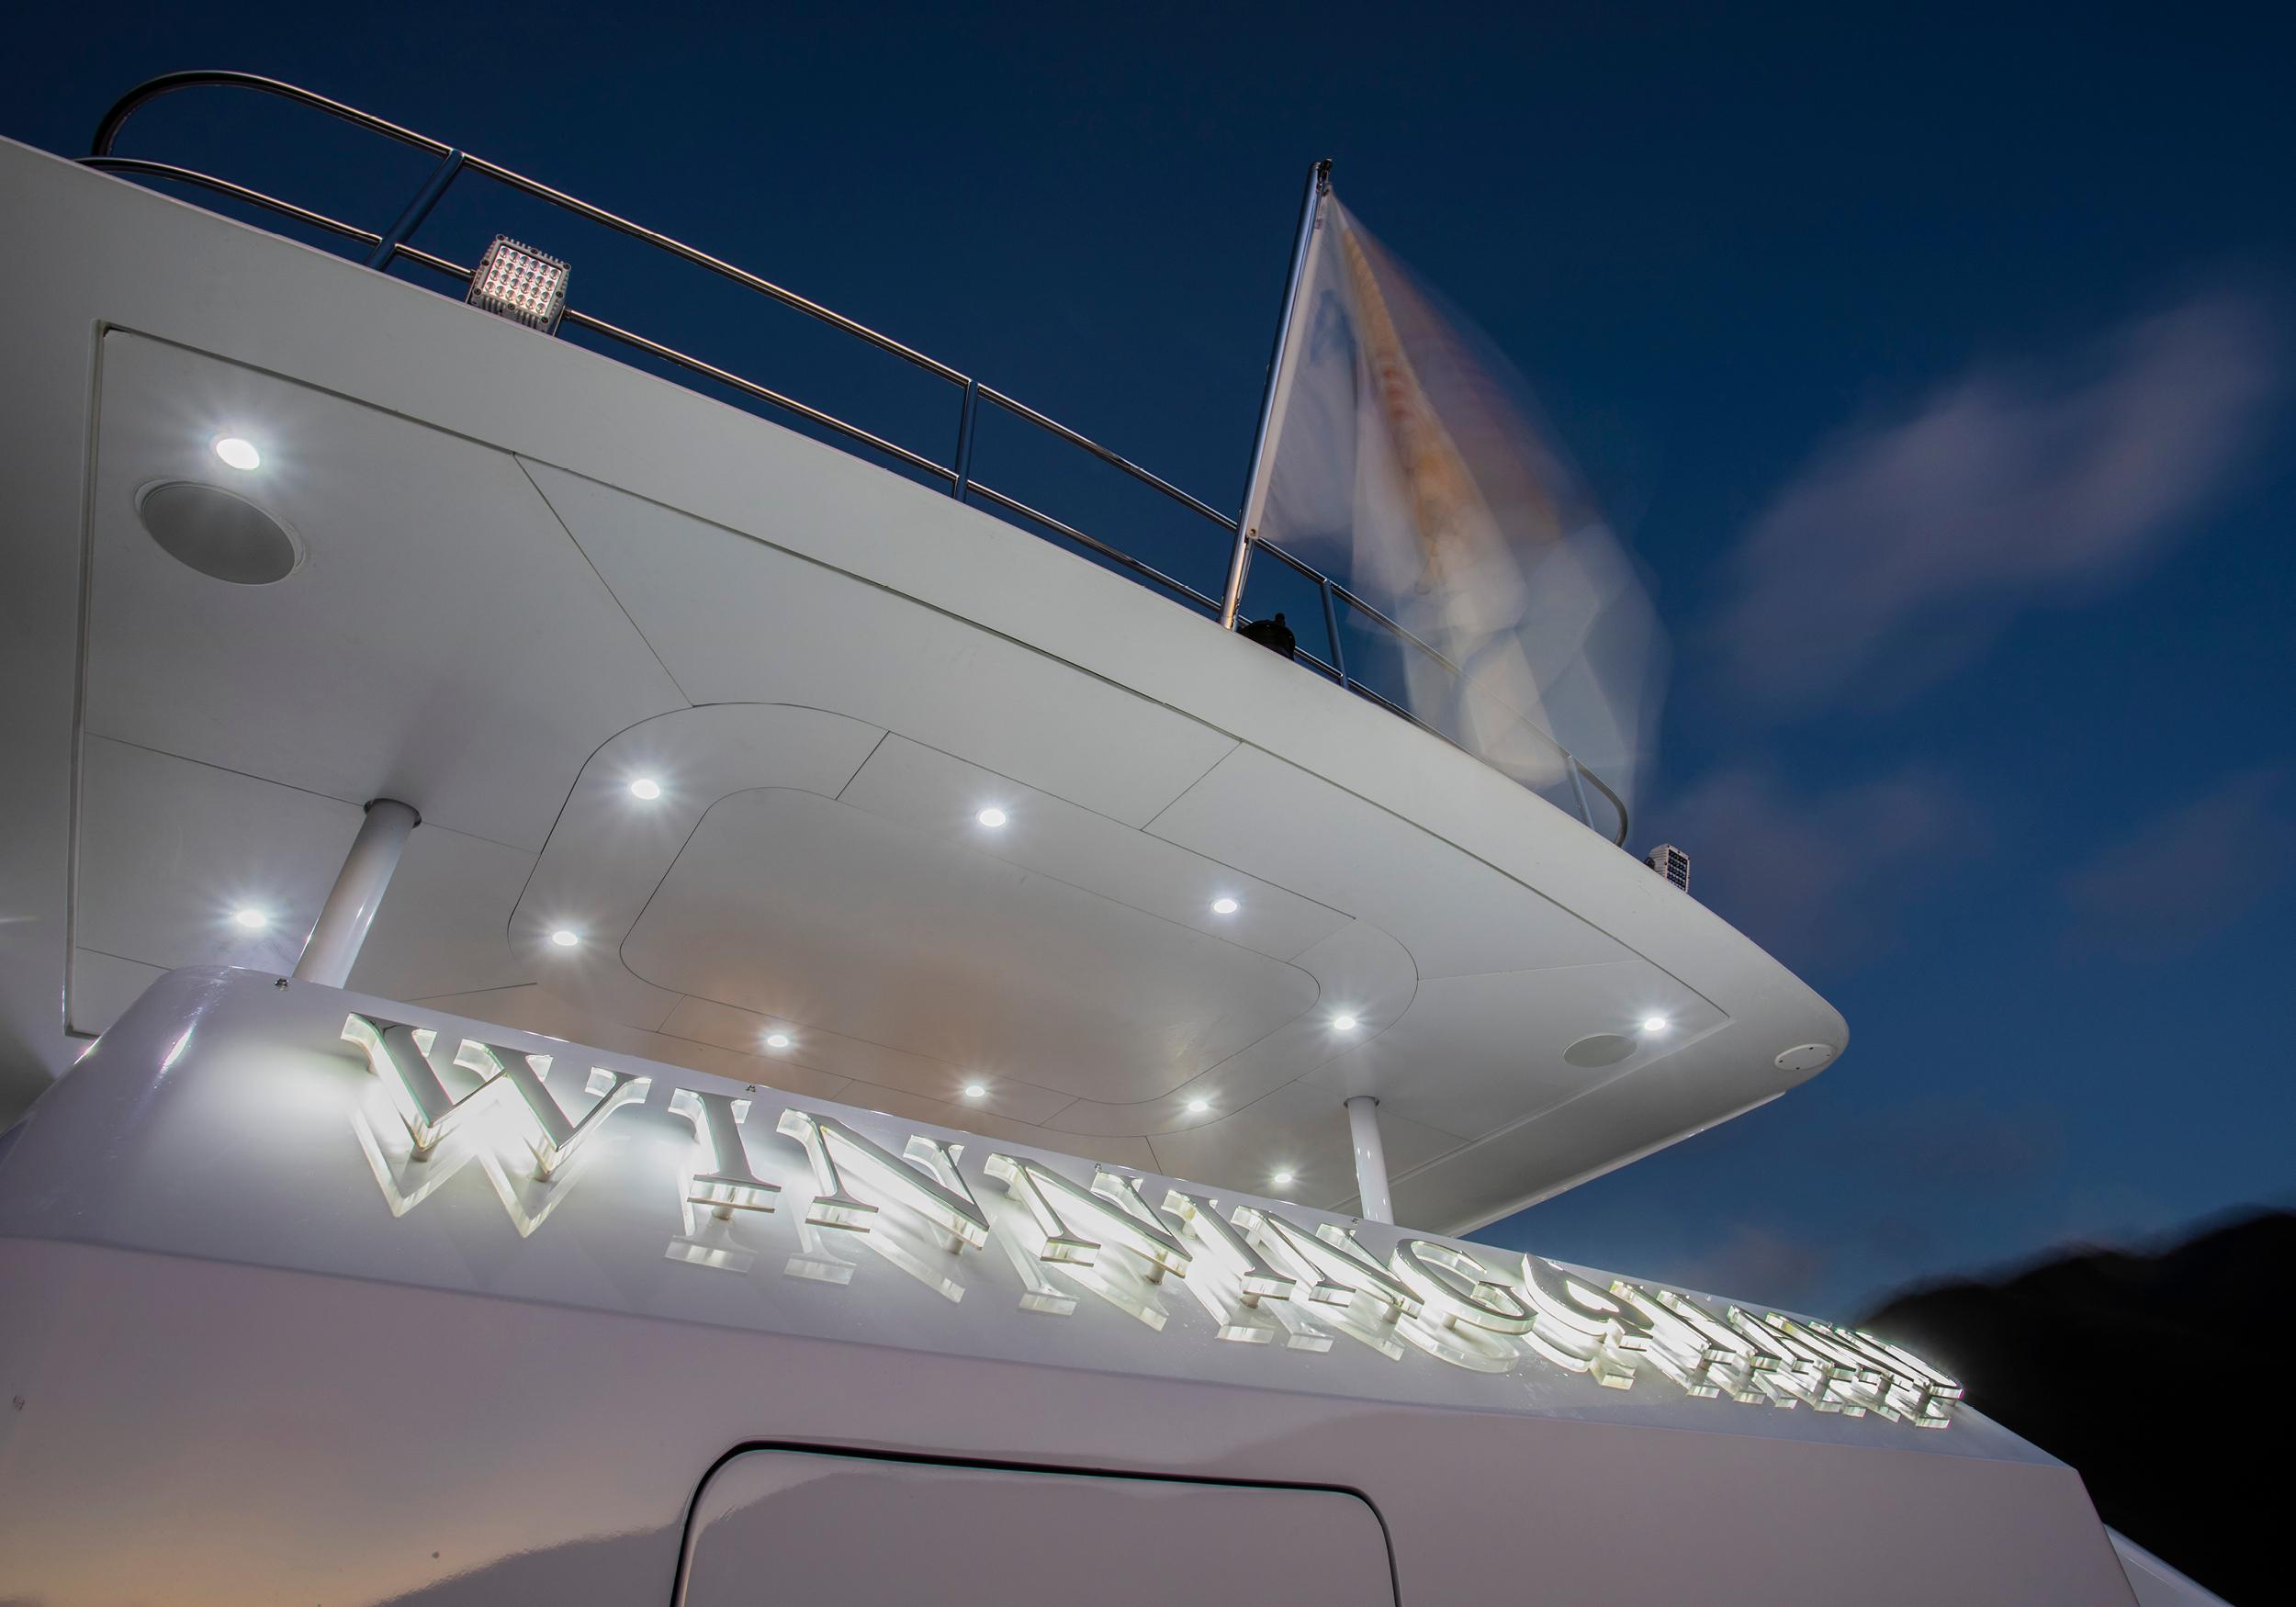 Karen-Lynn-Interior-Design-Yacht-Winning-Hand-2.jpg